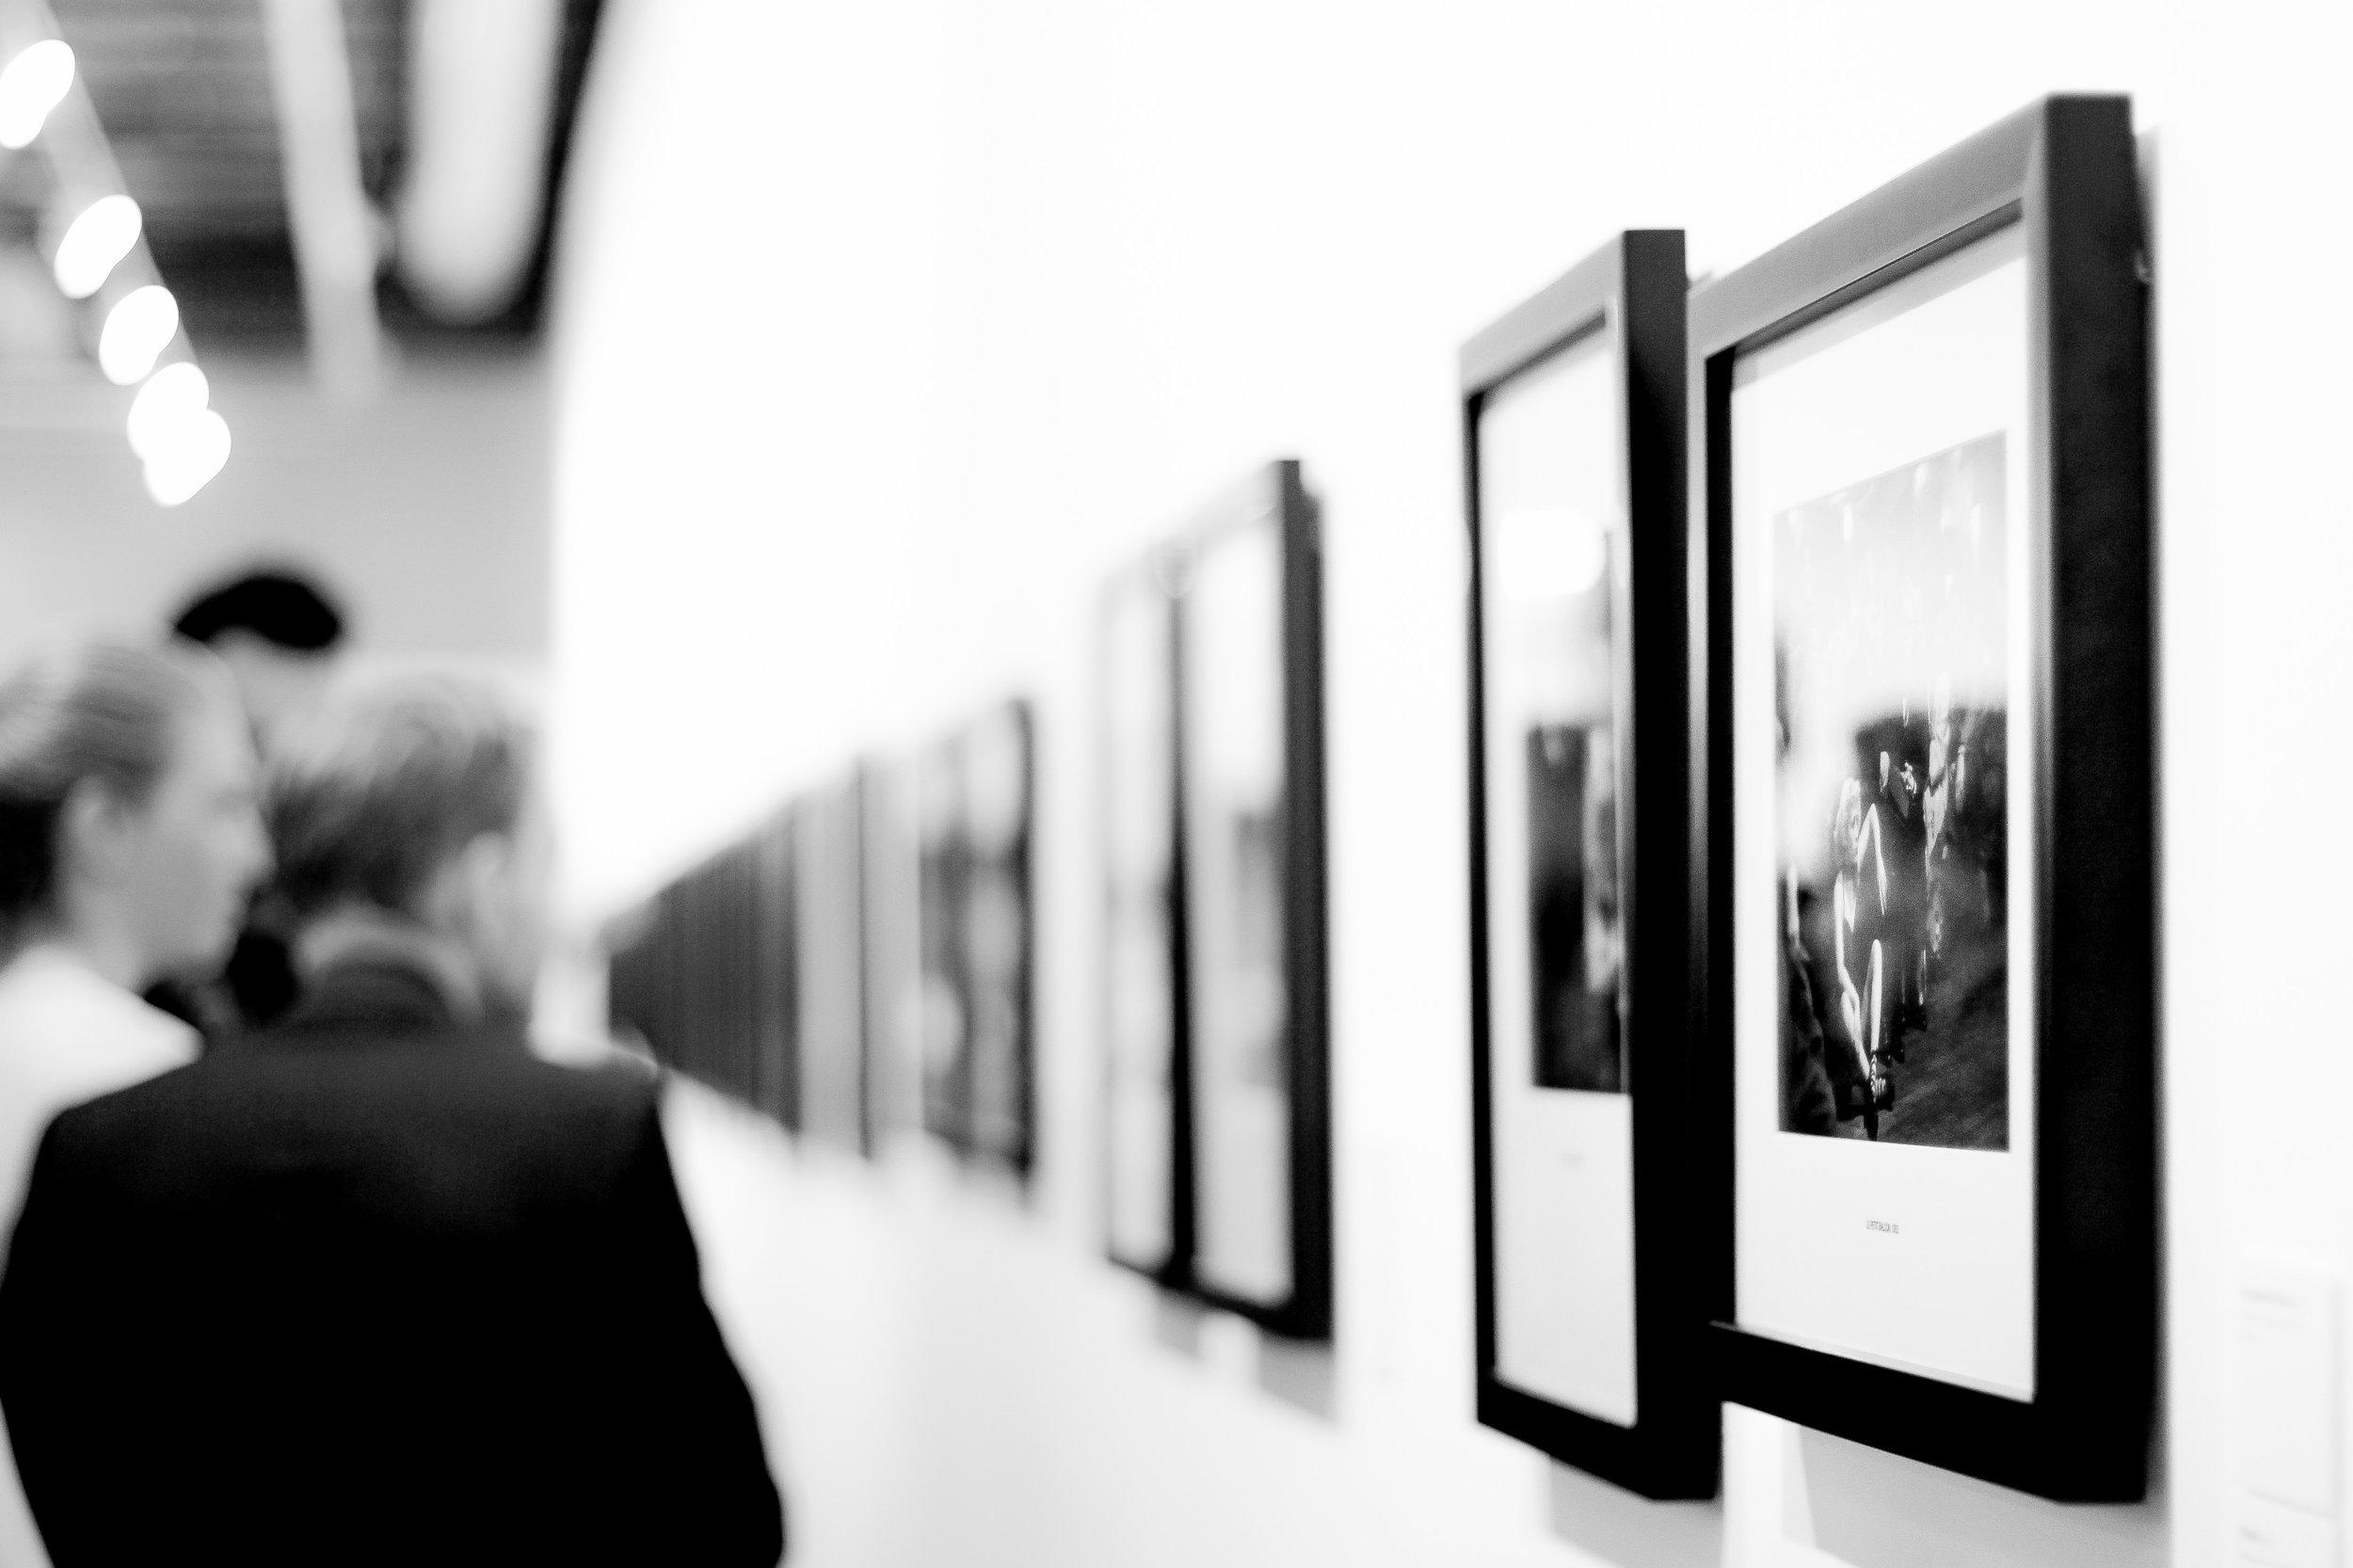 art-black-and-white-black-and-white-21264.jpg